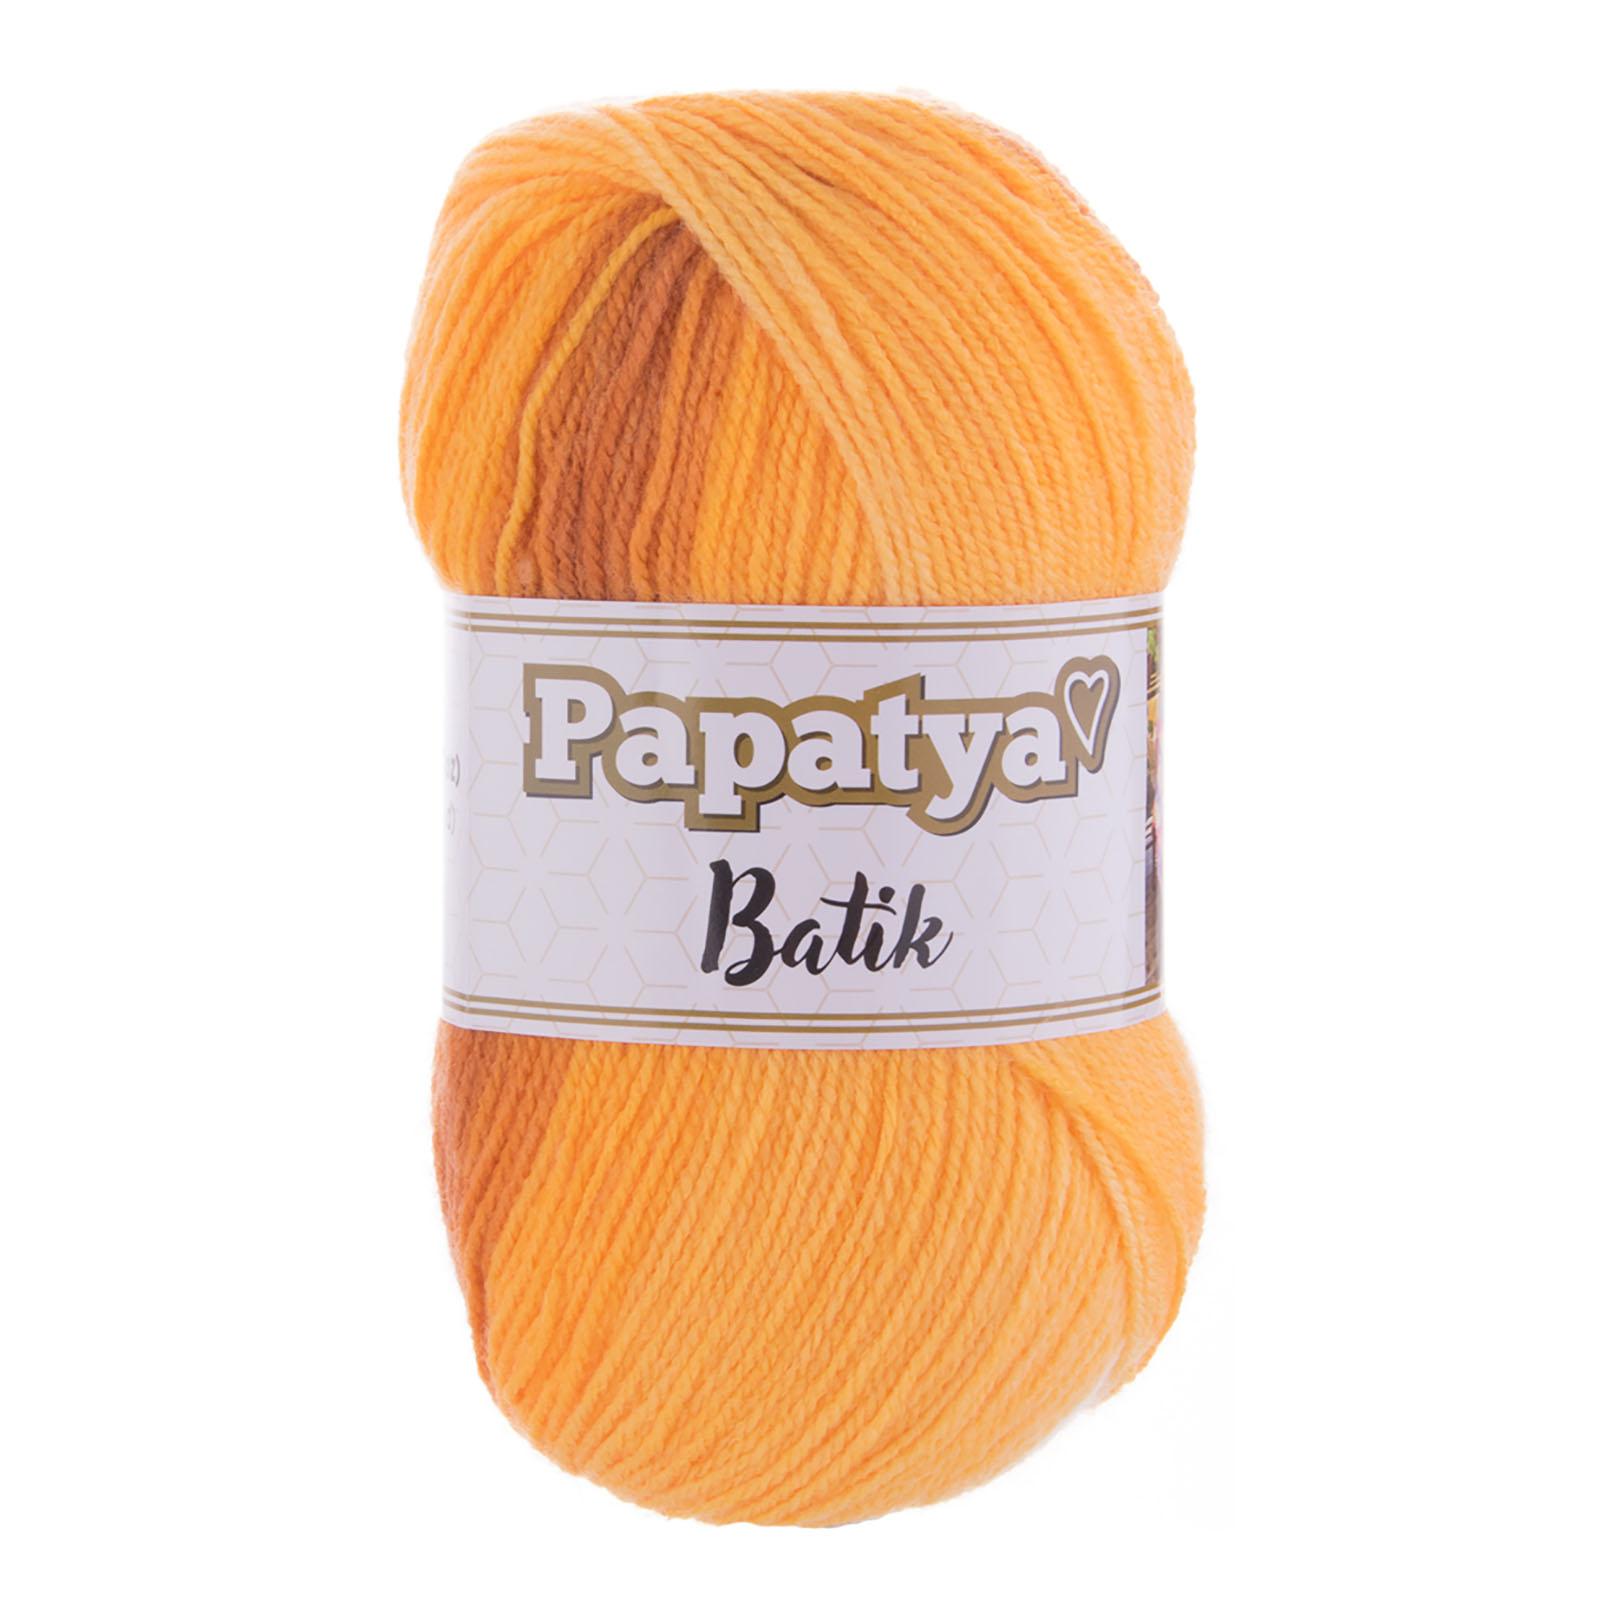 500g Farbverlaufsgarn Papatya Batik Strick-Wolle Strickgarn Häkelgarn Farbwahl – Bild 13